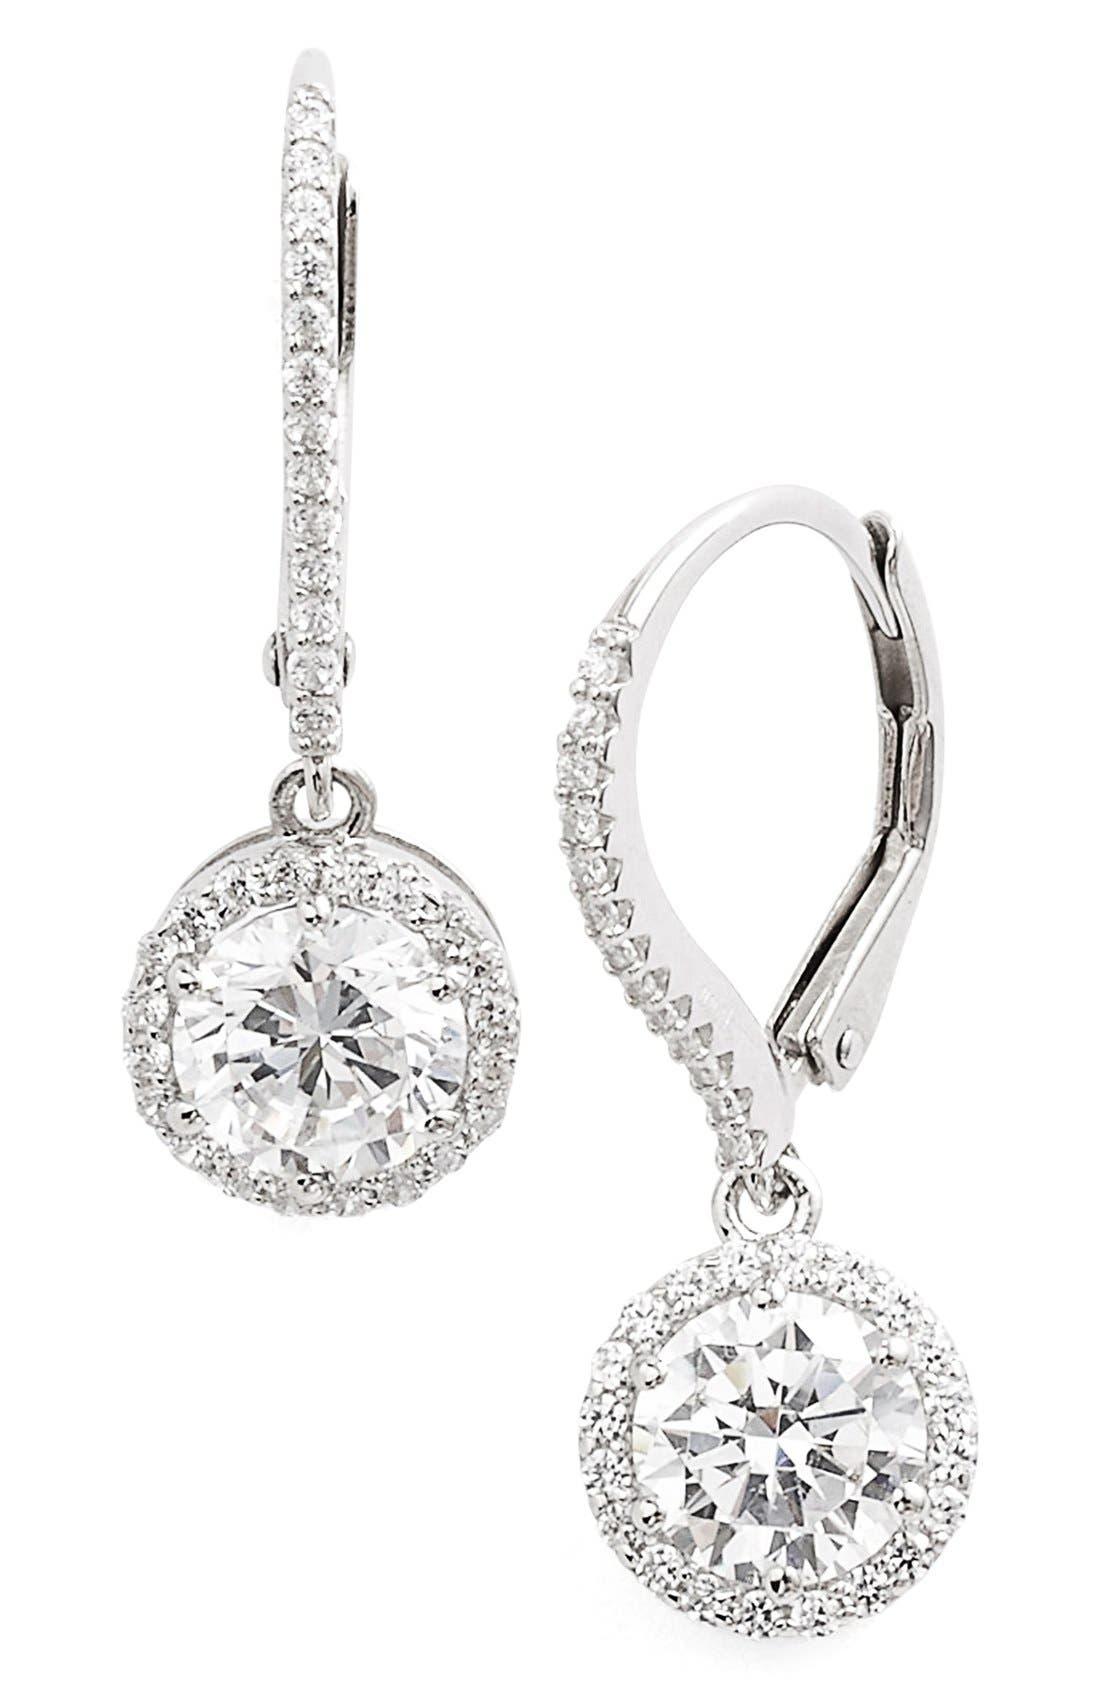 'Lassaire' Drop Earrings,                         Main,                         color, Silver/ Clear